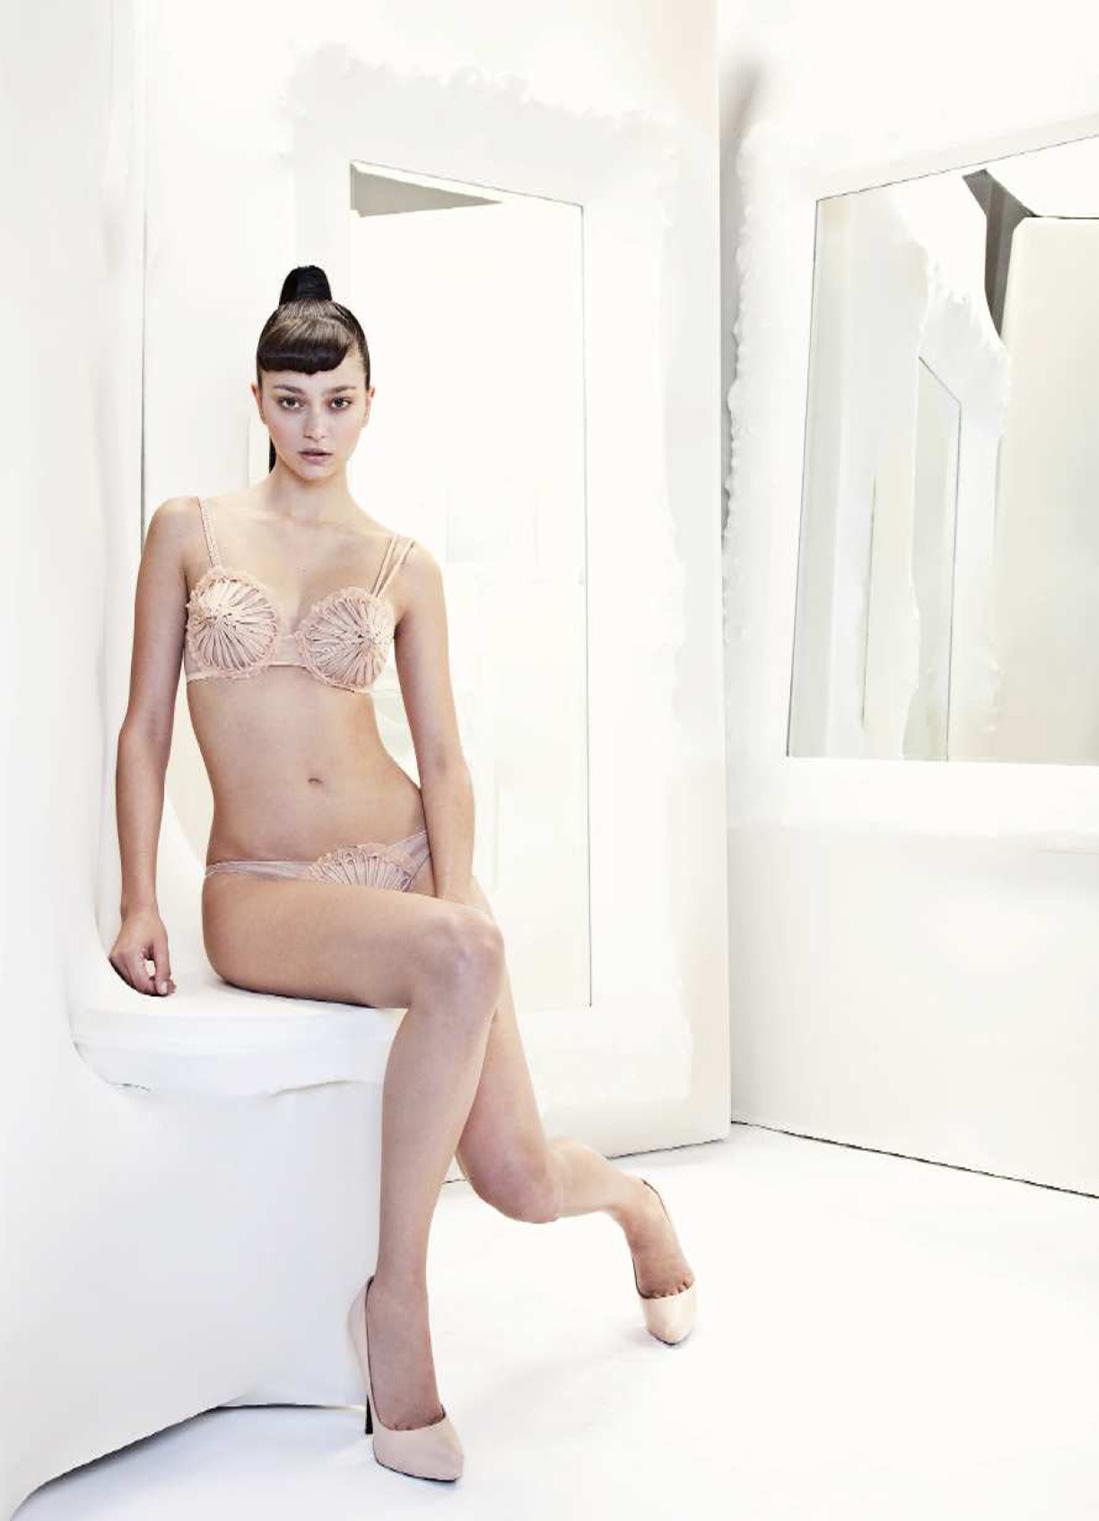 Jean-Paul-Gaultier-La-Perla-handmade-lingerie-1